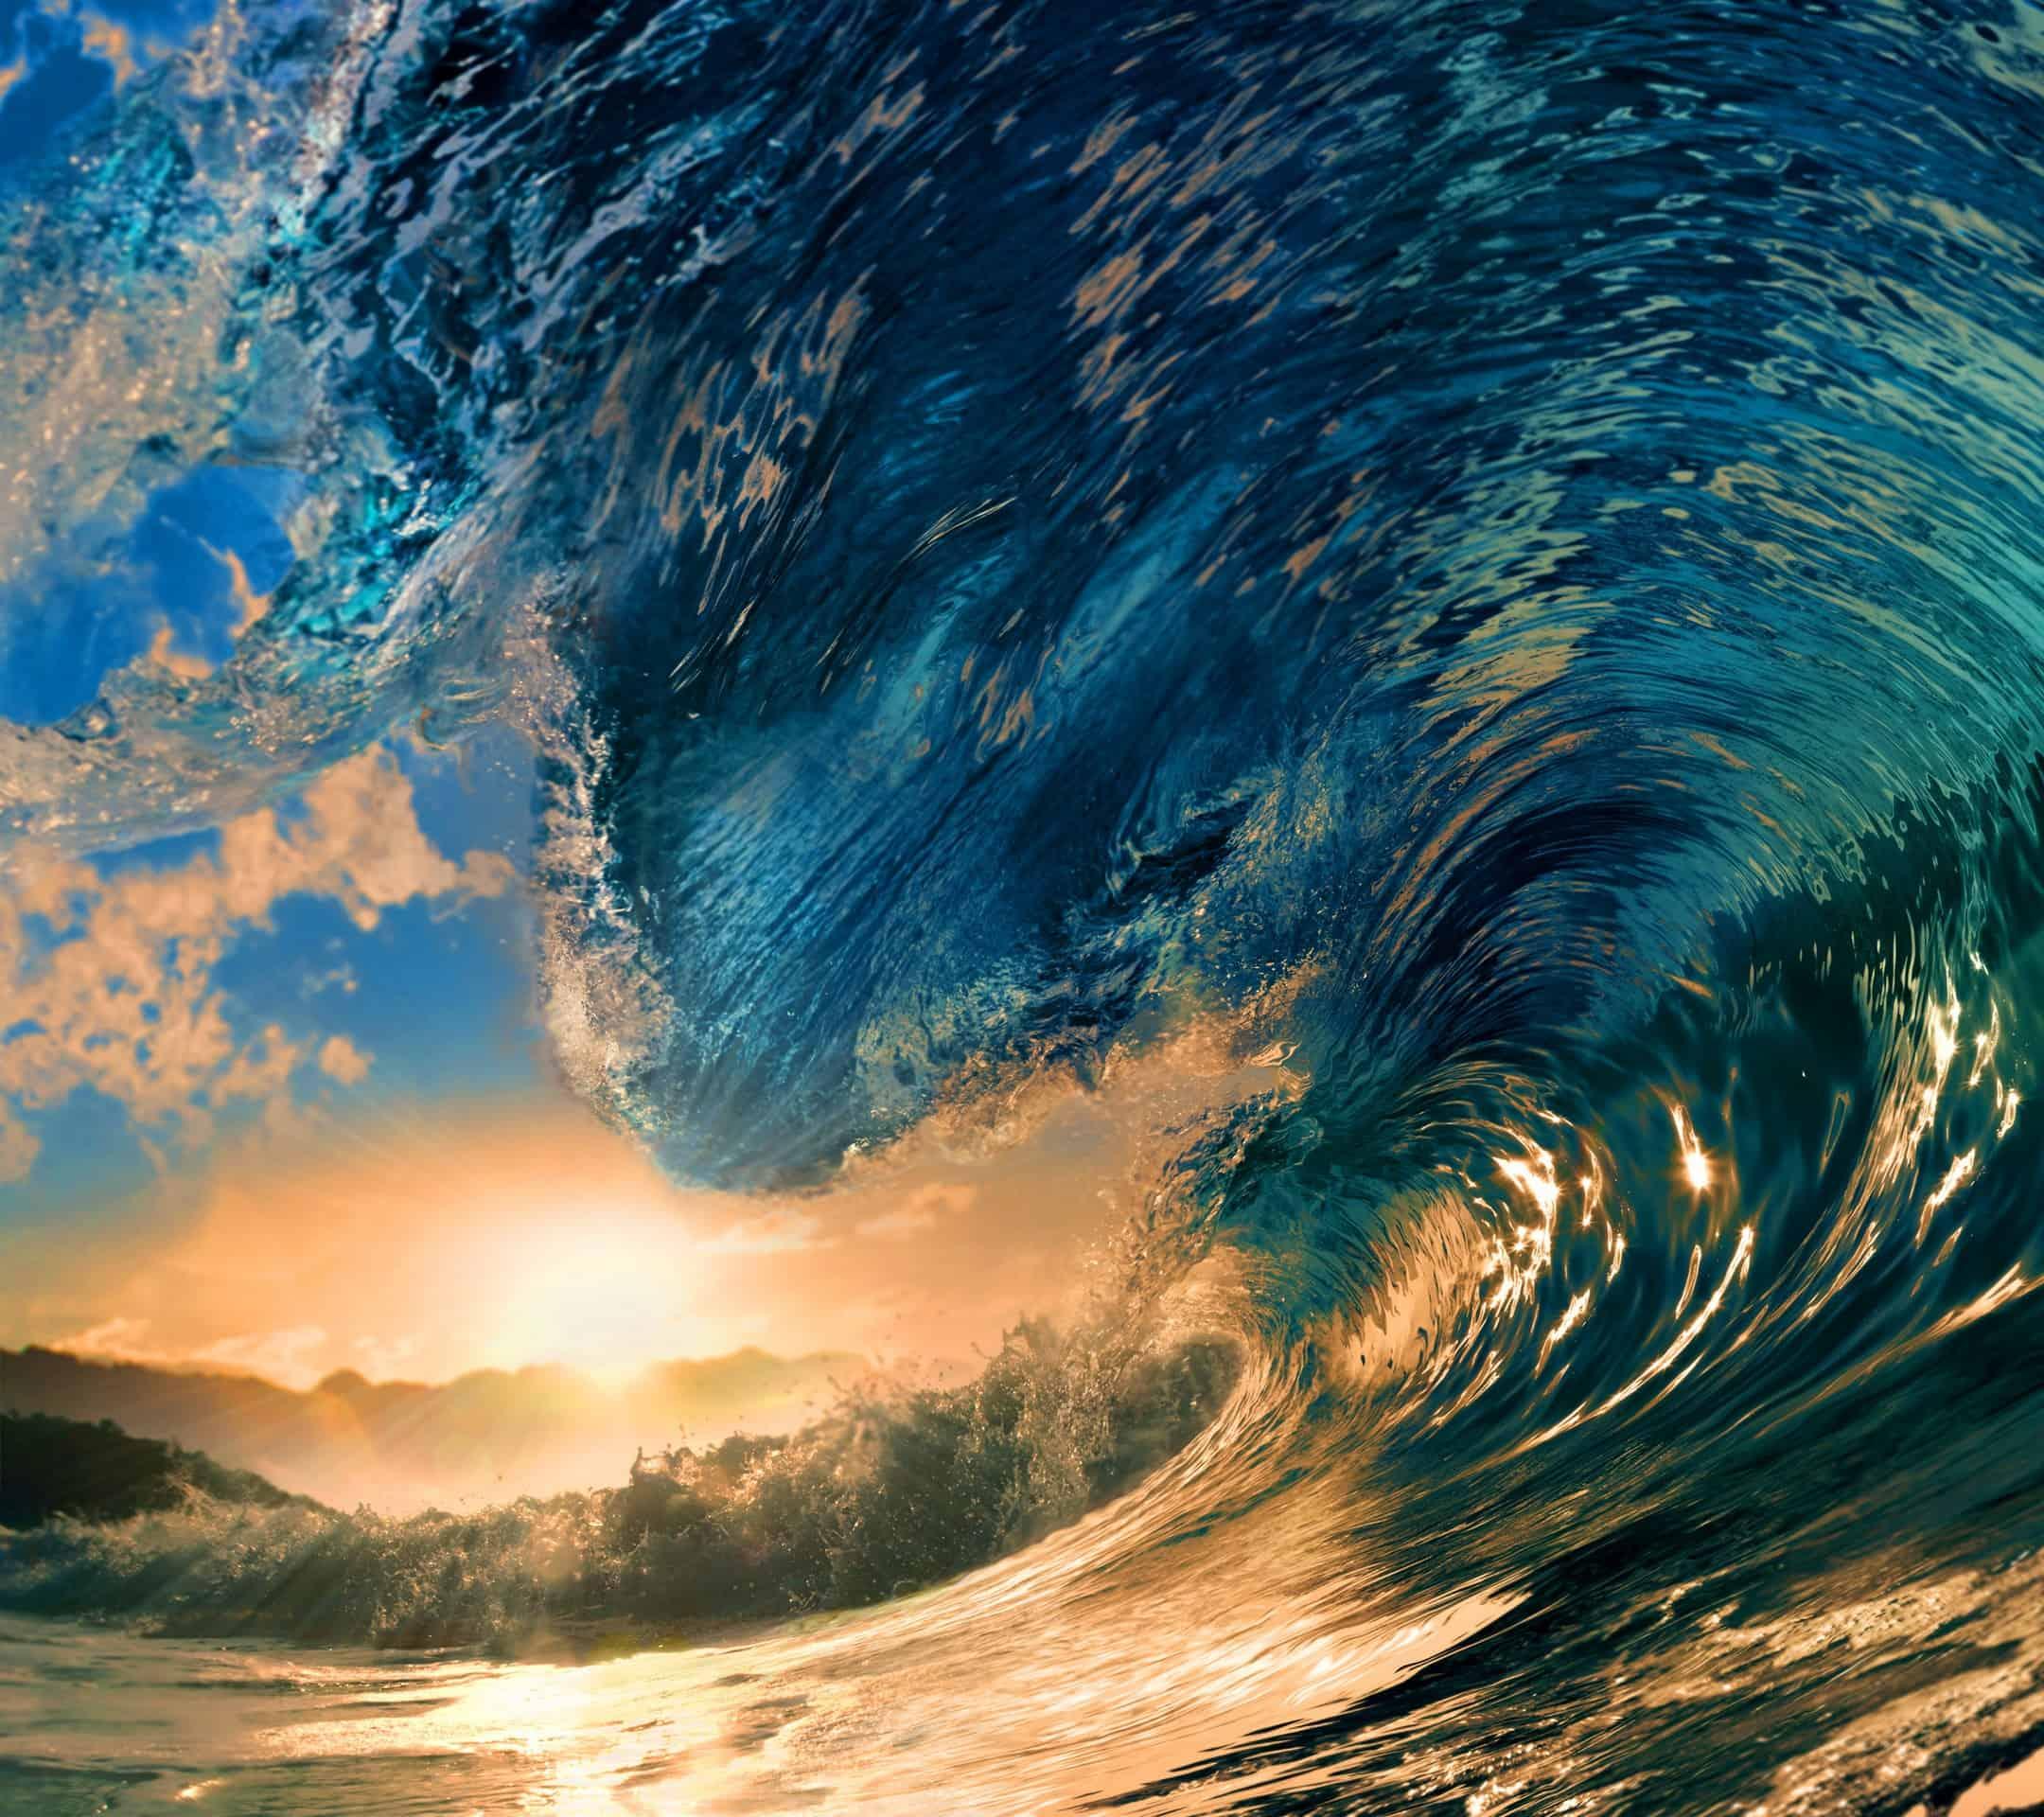 Hd Ocean Wallpaper: 2160x1920 Wallpapers